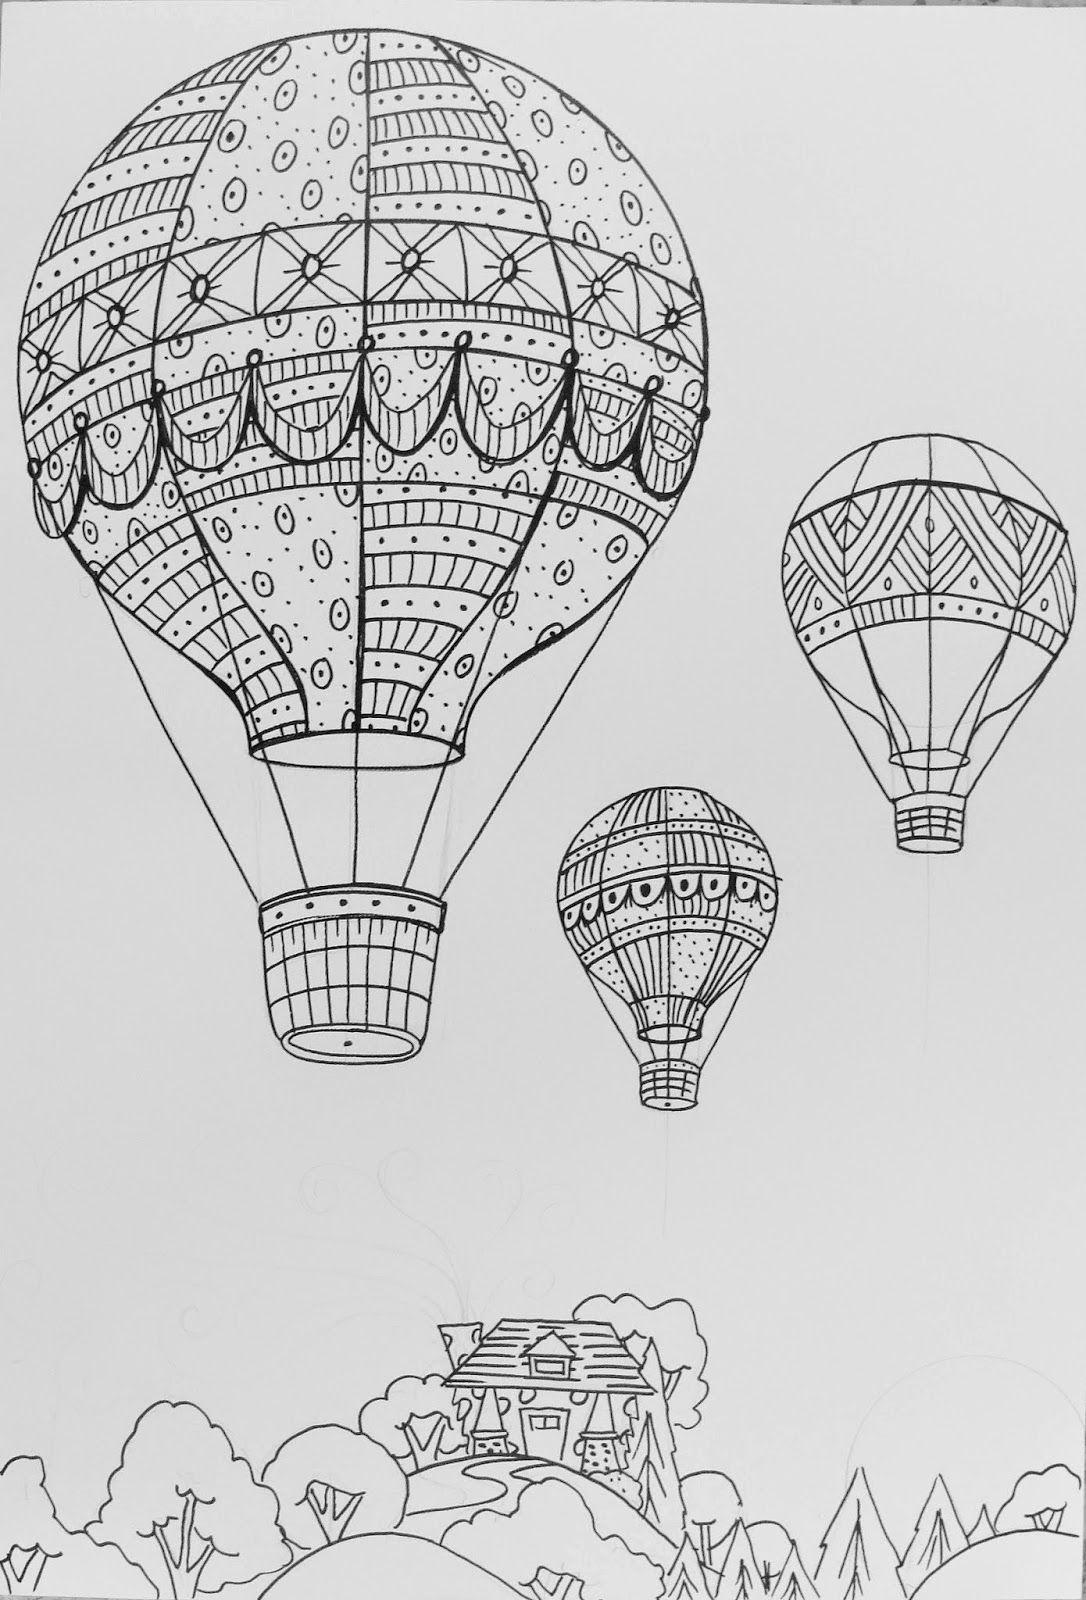 kic art display december 2014 advanced step by step easy step by step use step air balloon